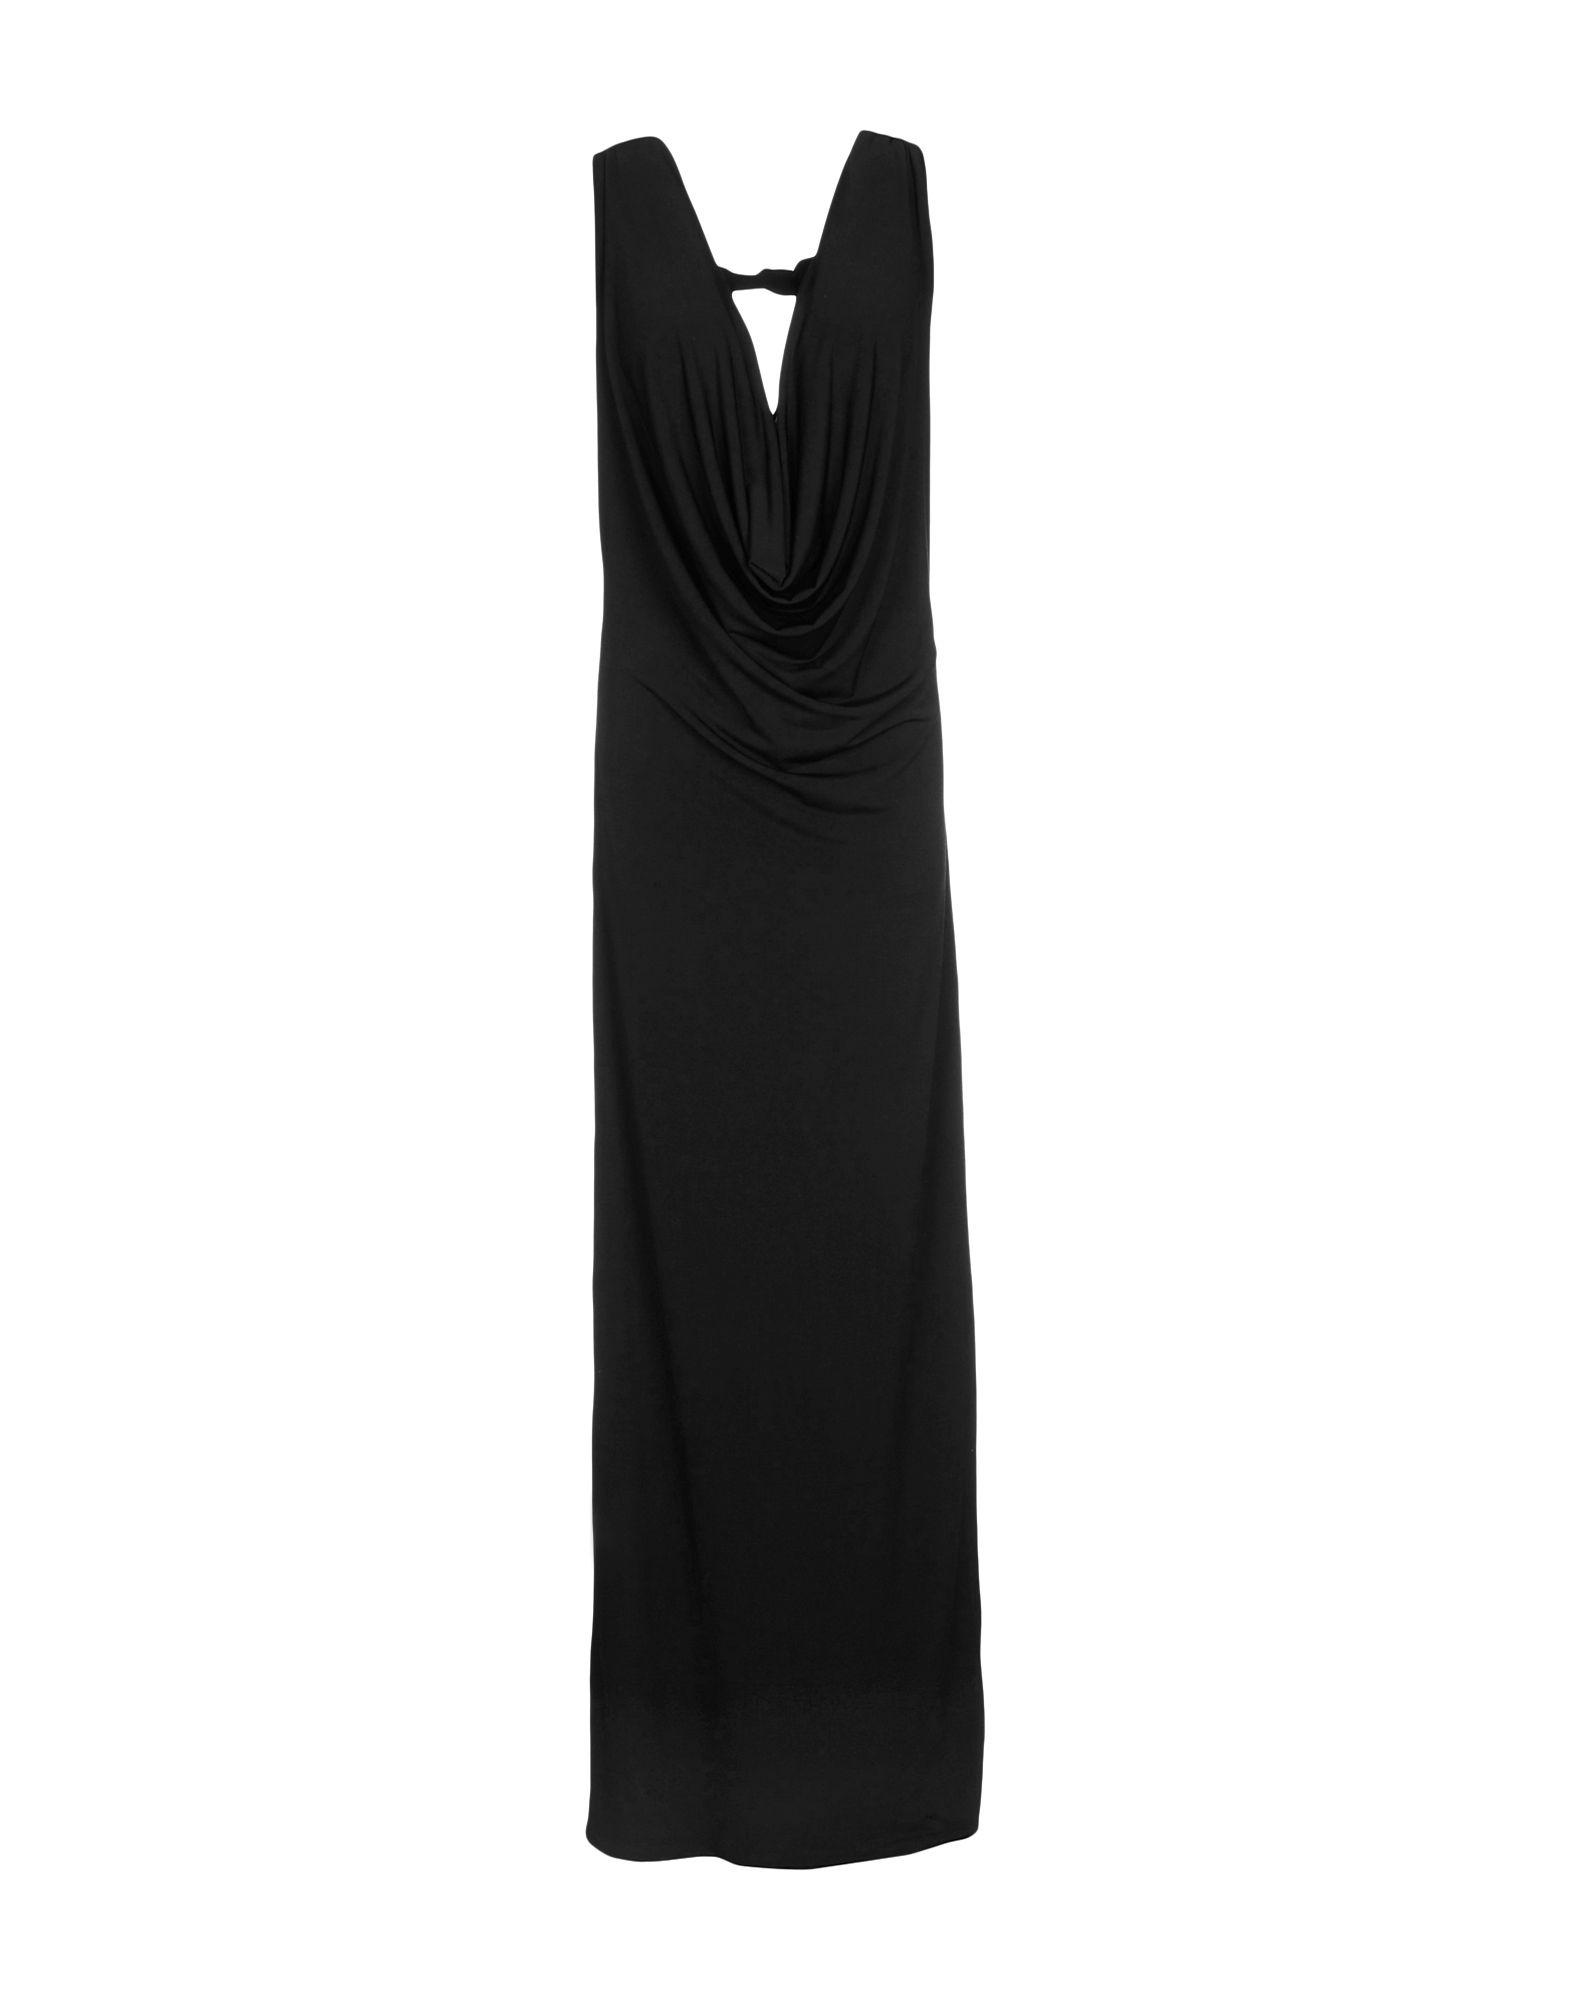 Vestito Lungo Sen Donna - Acquista online su bNSLFMsf